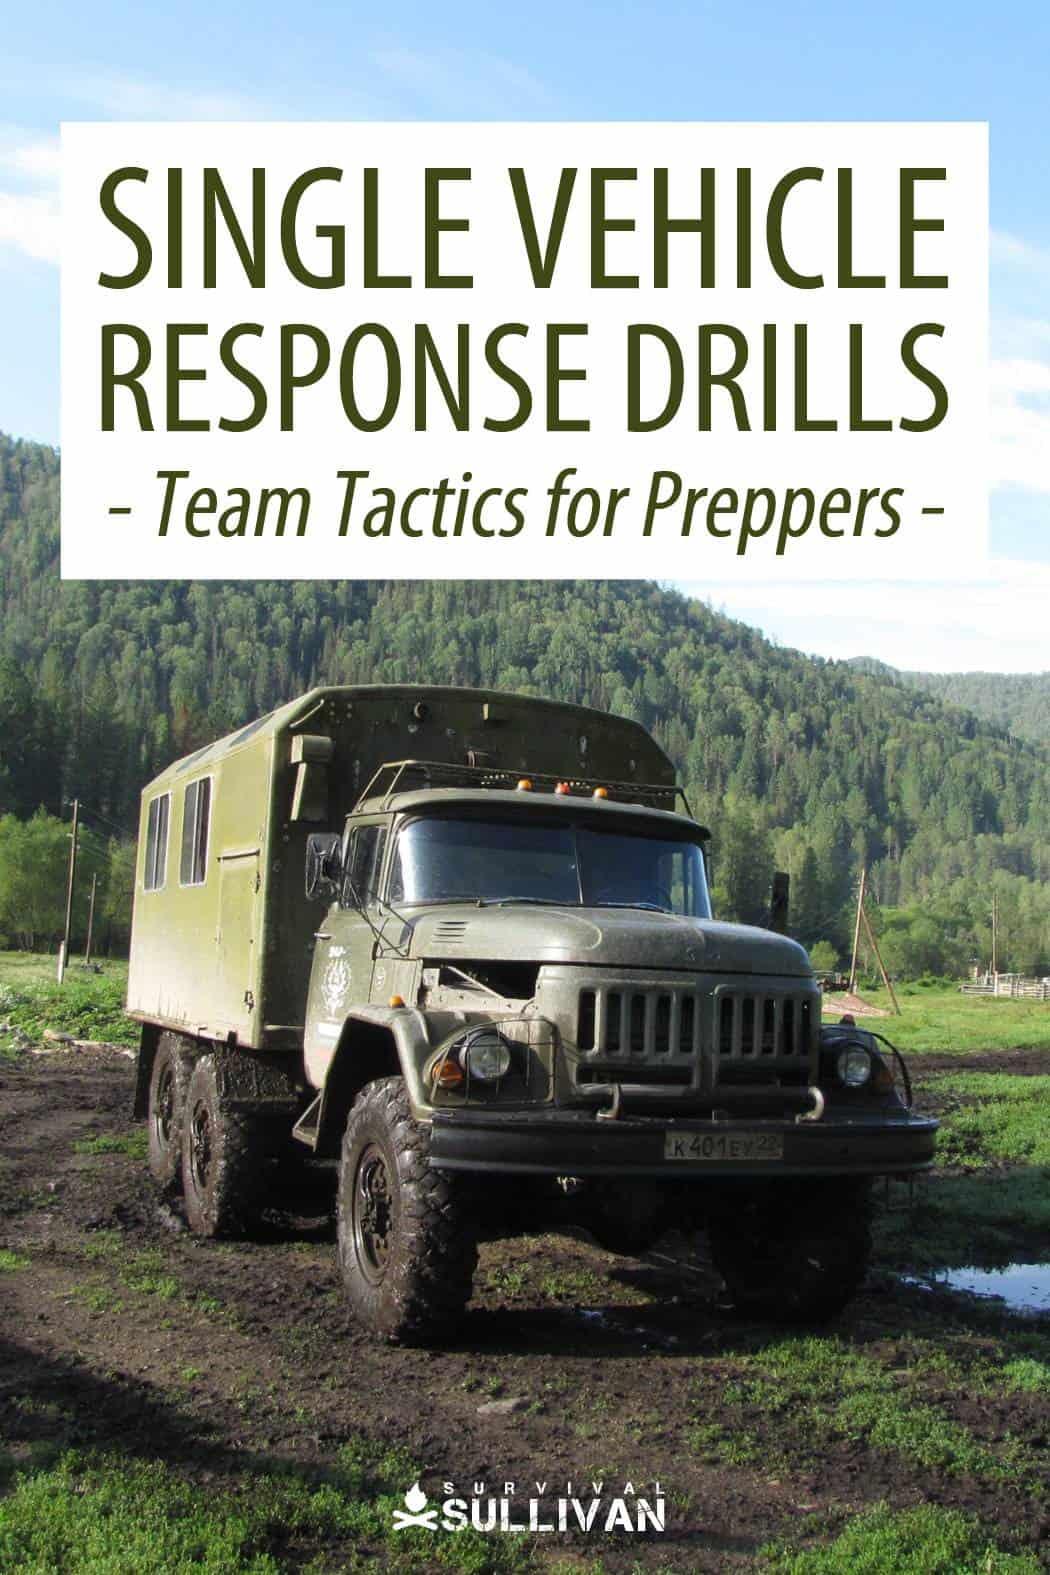 single vehicle response drills Pinterest image